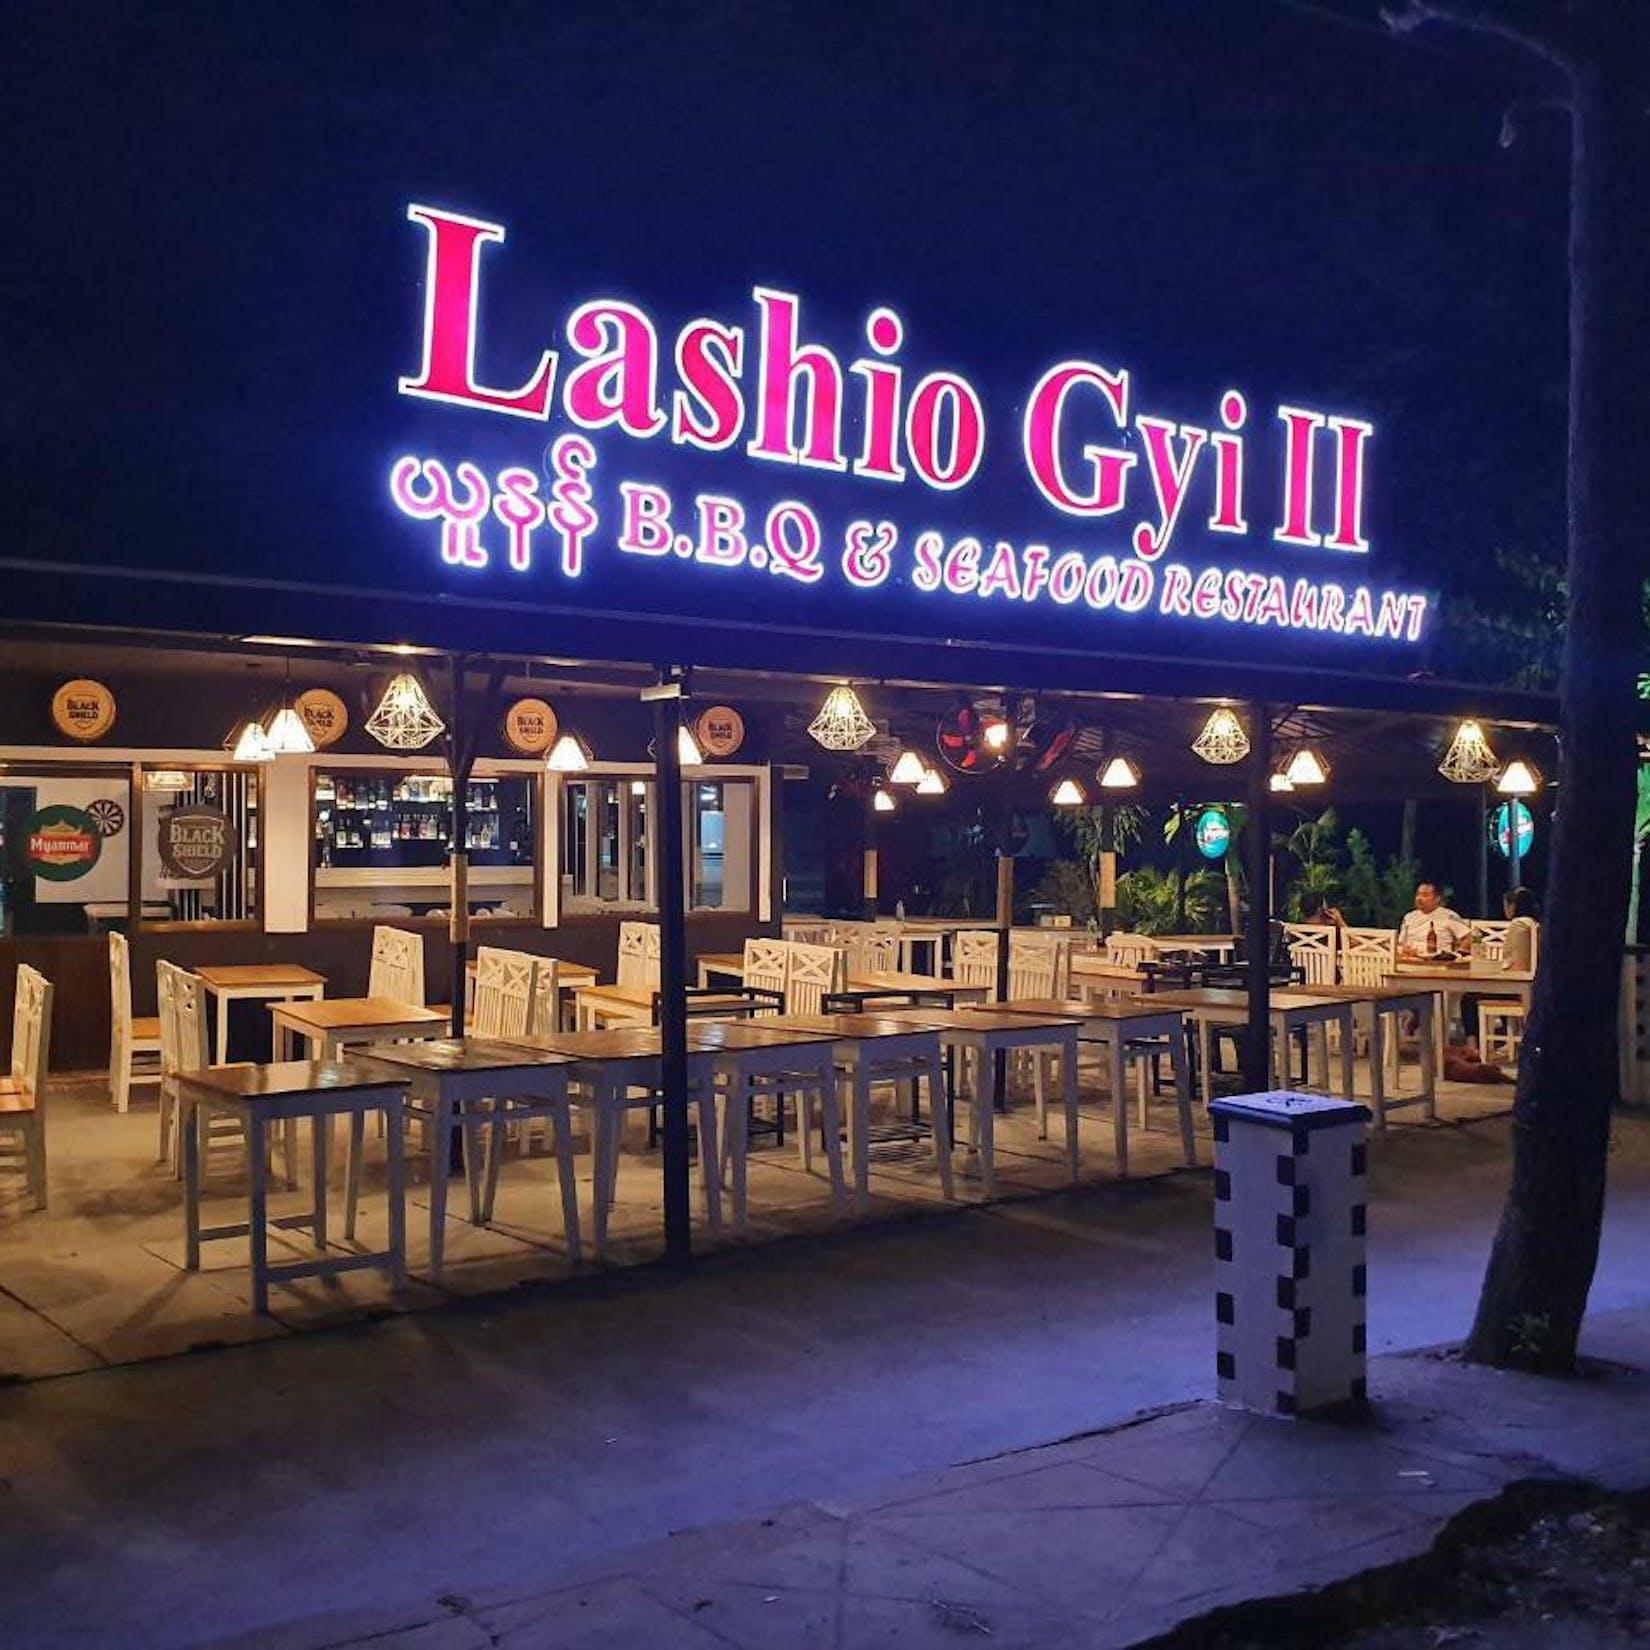 Lashio Gyi (2) Yunan B.B.Q & Seafood Restaurant | yathar